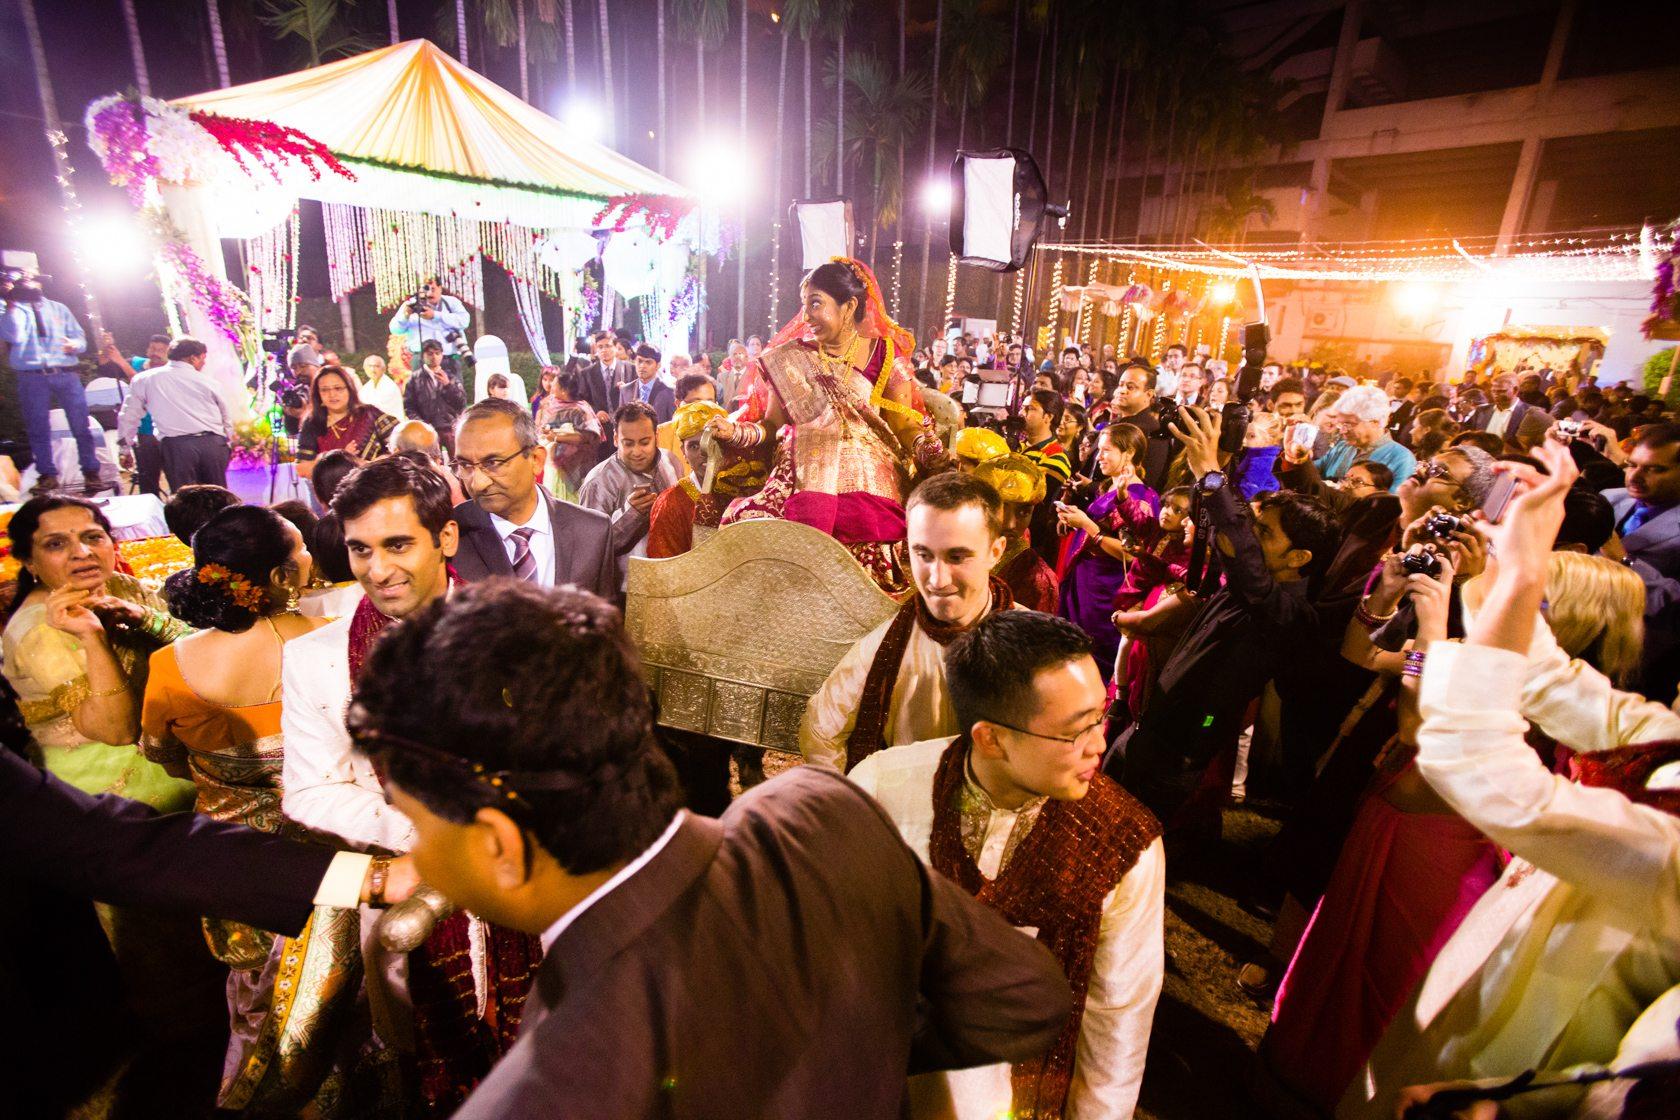 India_Wedding_146.jpg